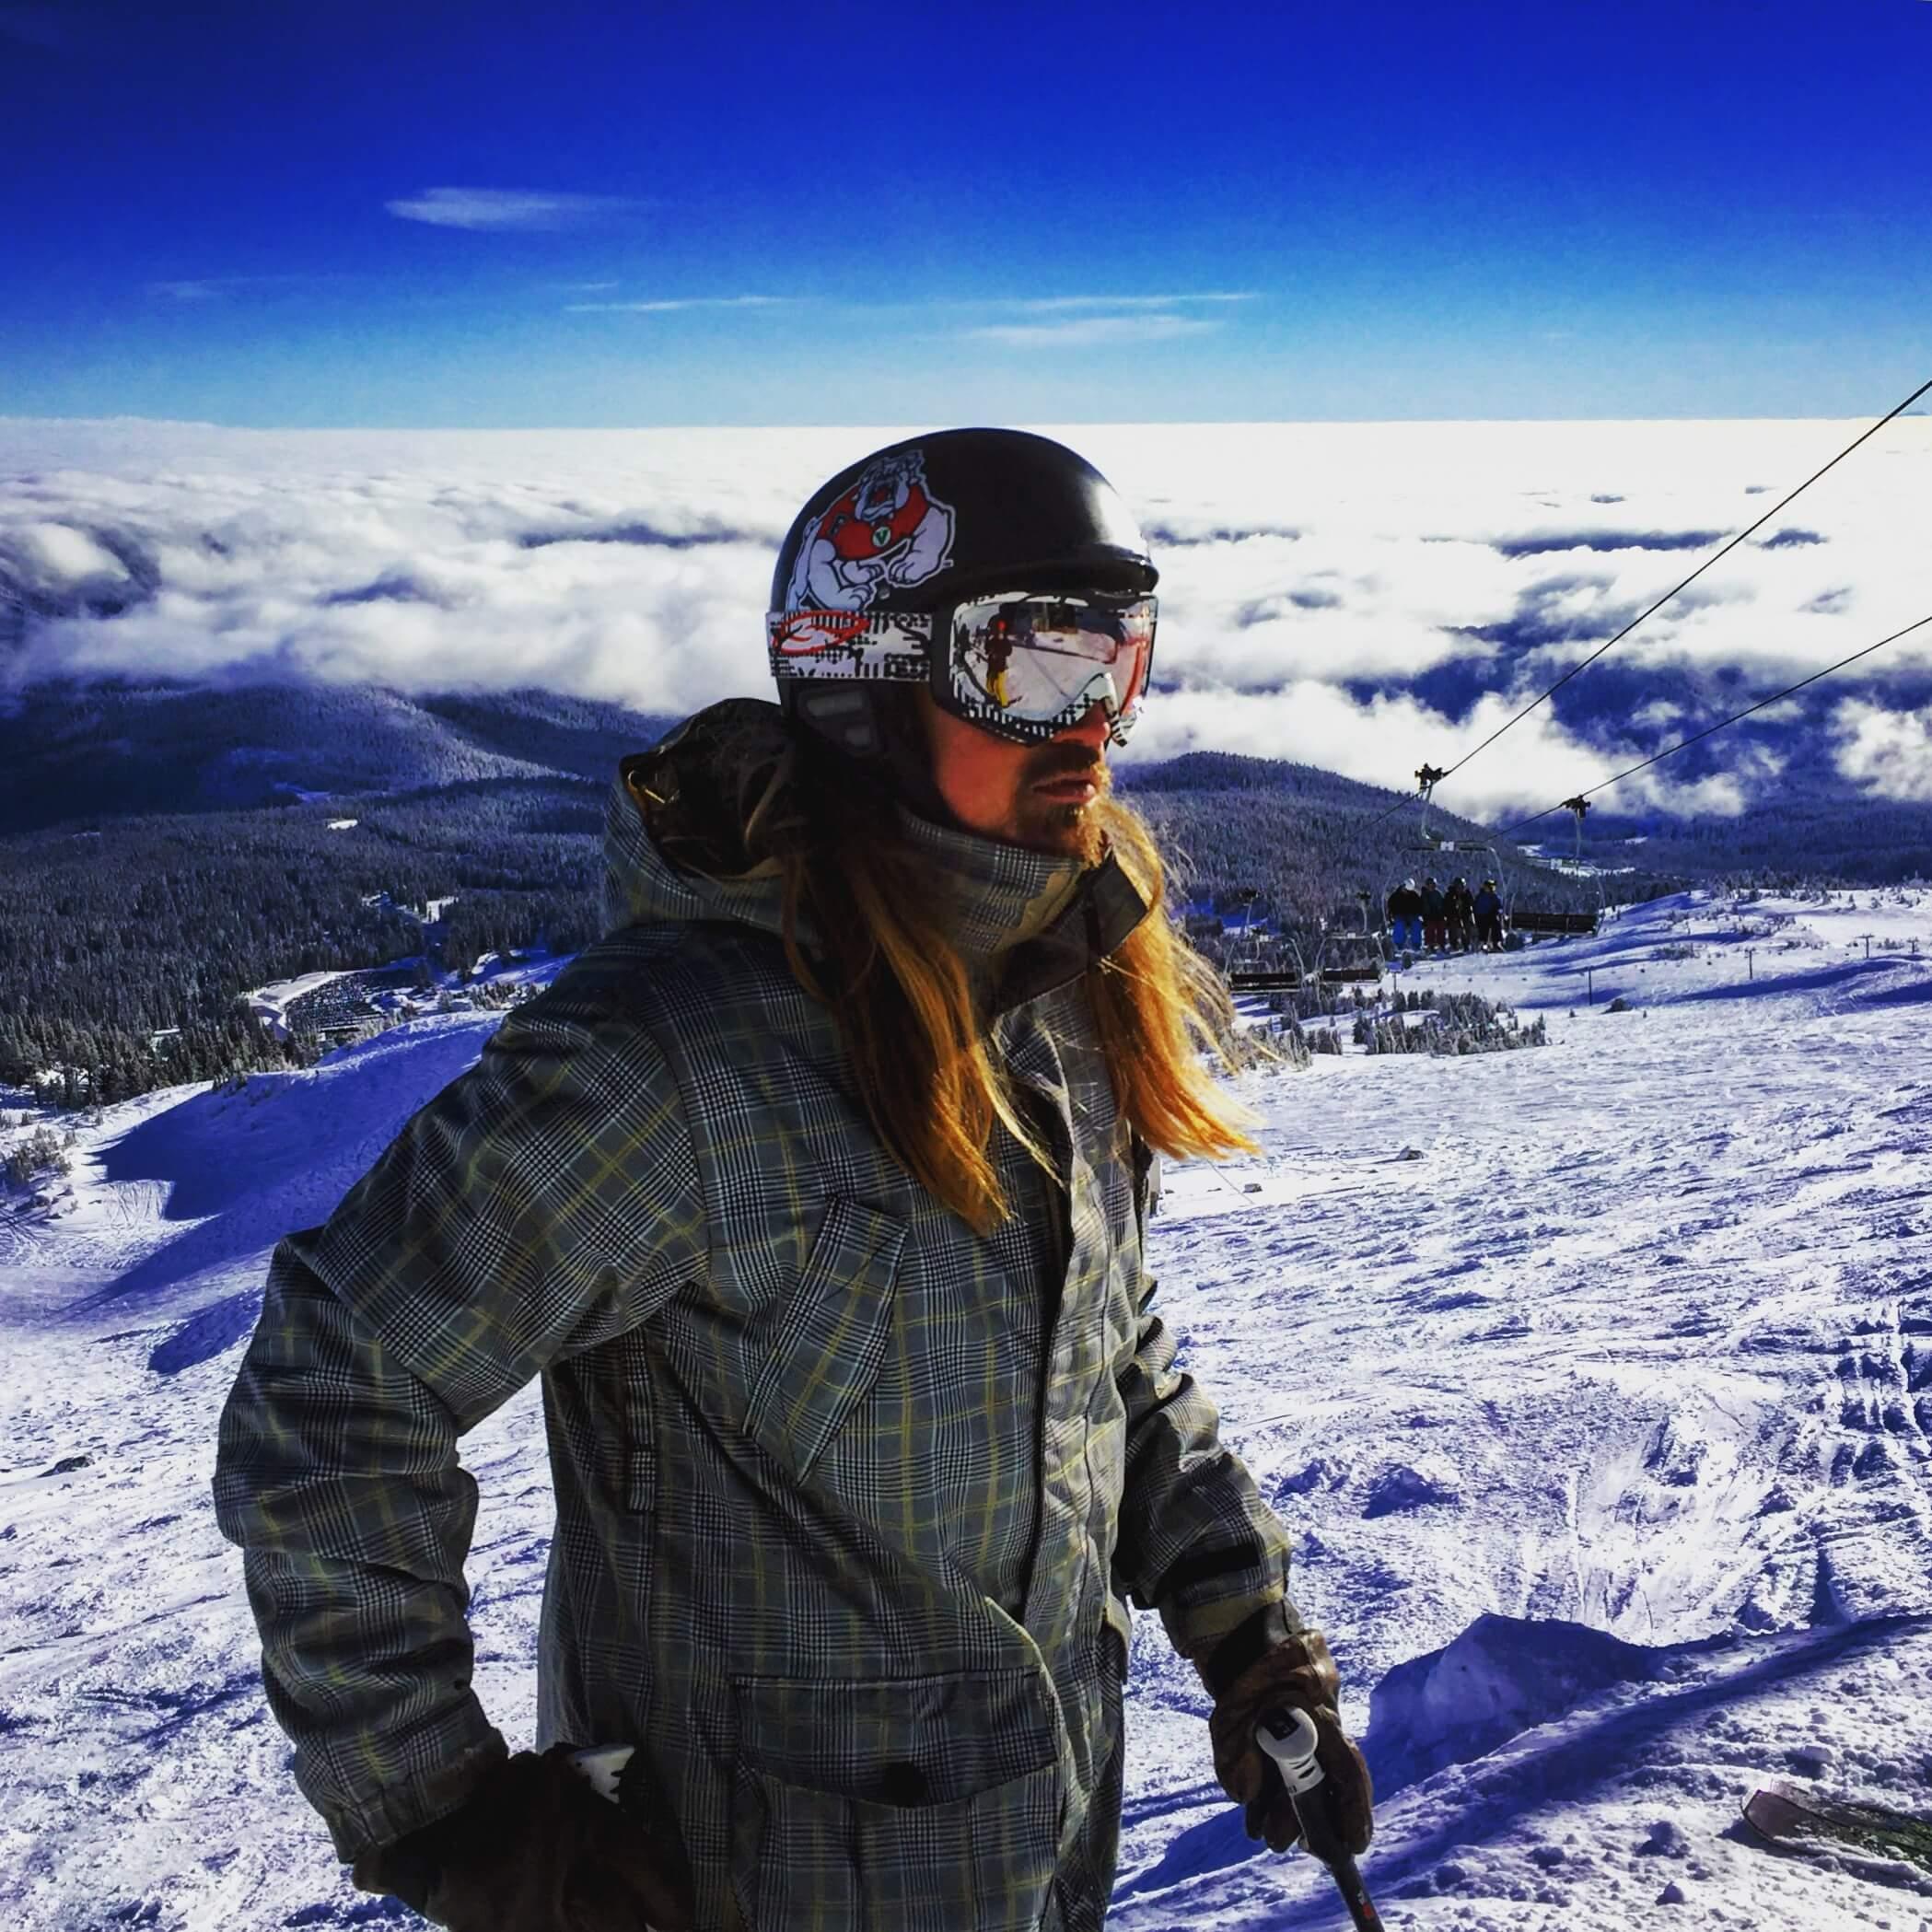 El Rubio demonstrating long hair in athletics: skiing and snowboarding